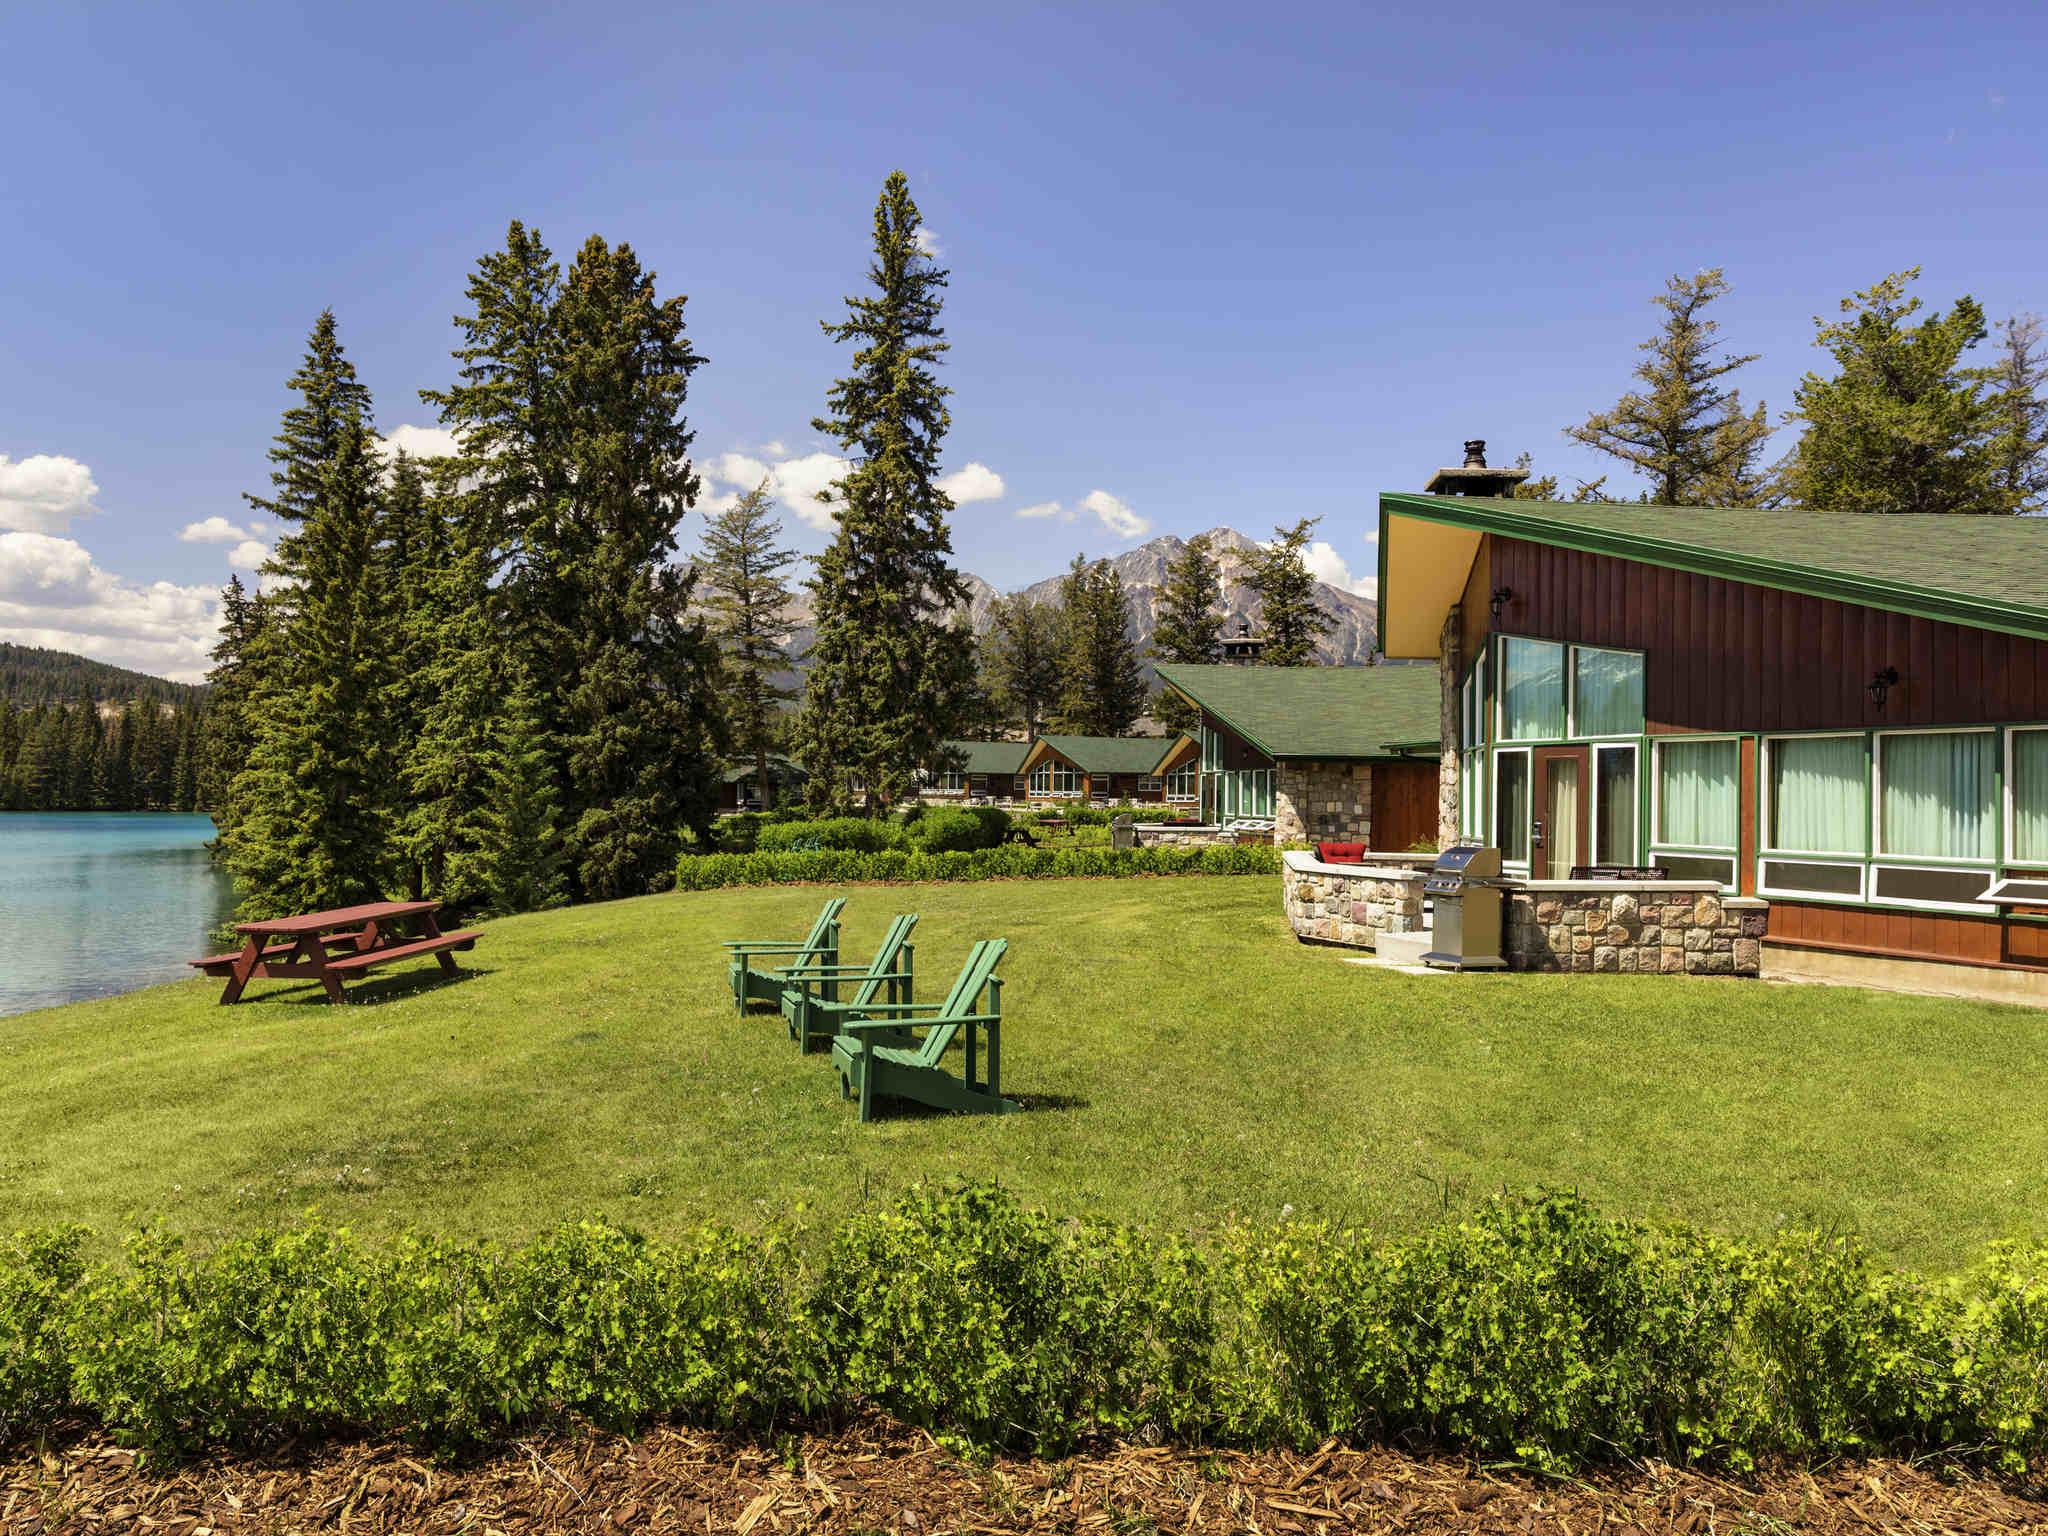 hotel in jasper fairmont jasper park lodge. Black Bedroom Furniture Sets. Home Design Ideas